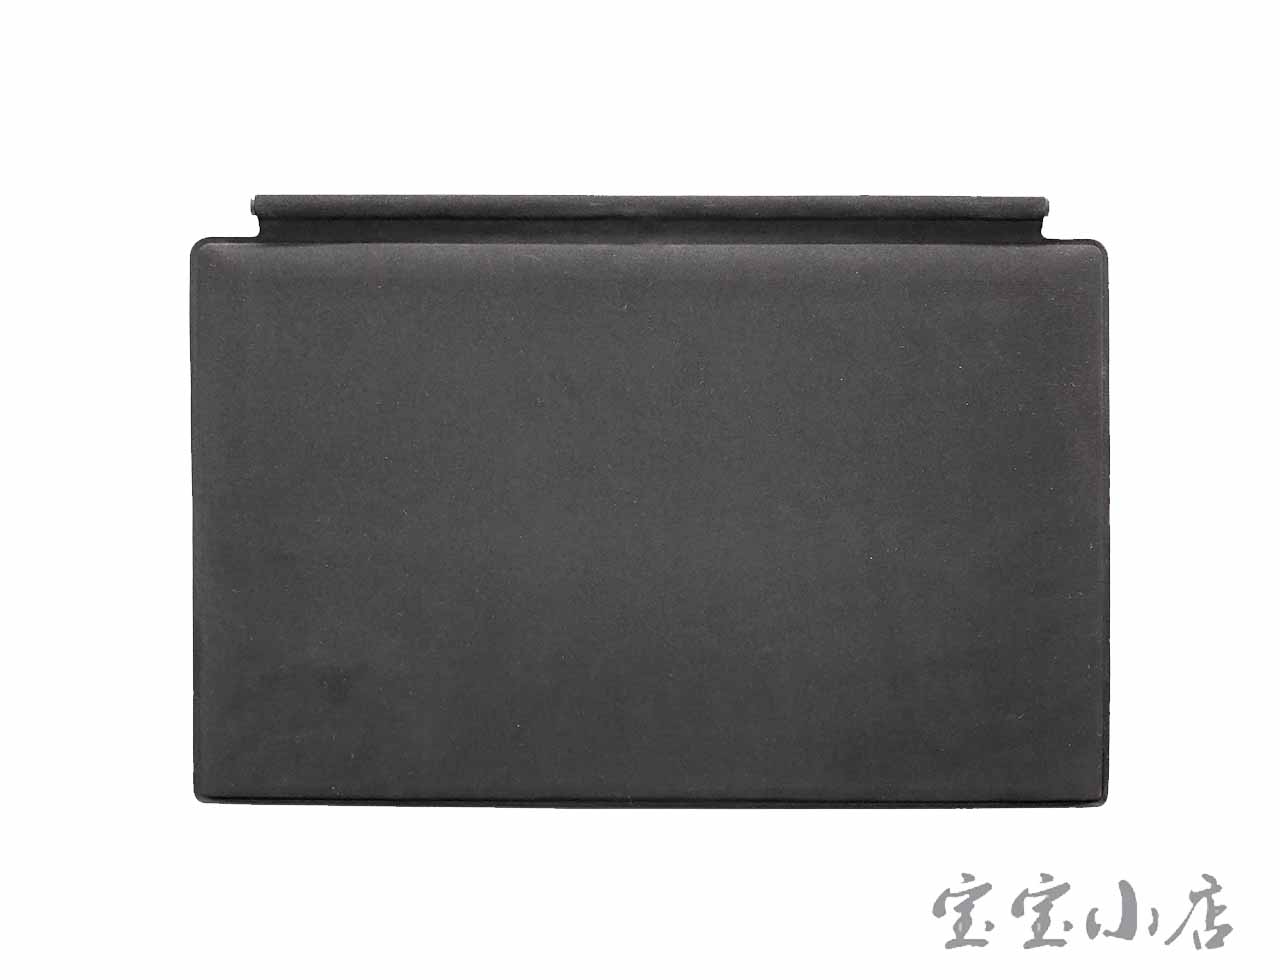 Hasee/神舟 PCpad Plus Pro 平板 EB10S01键盘皮套 BKC800 13.3寸 black keyboard